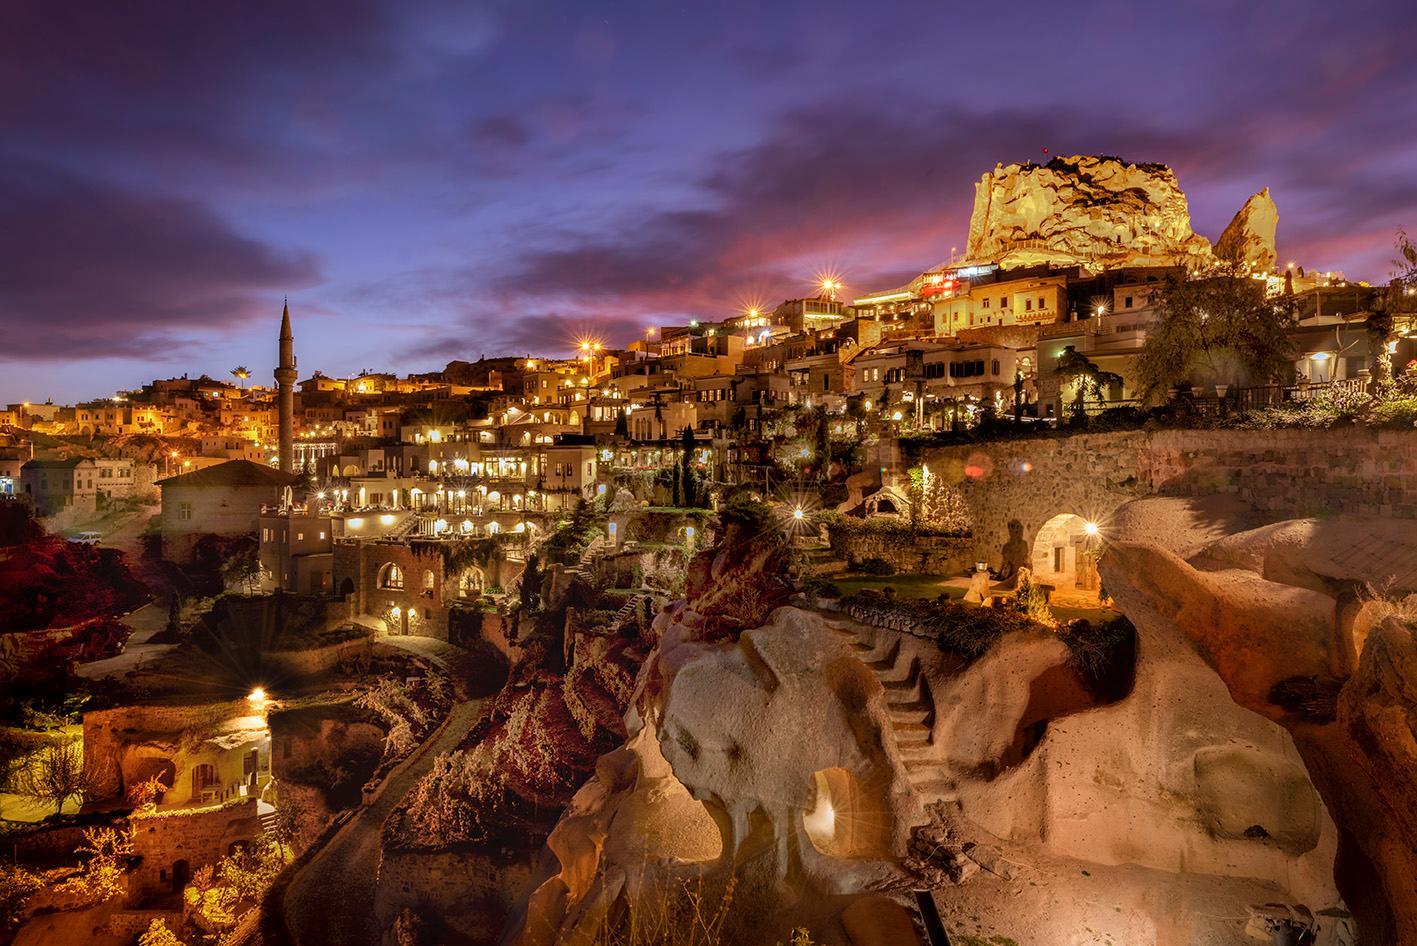 Outside View of Argos in Cappadocia